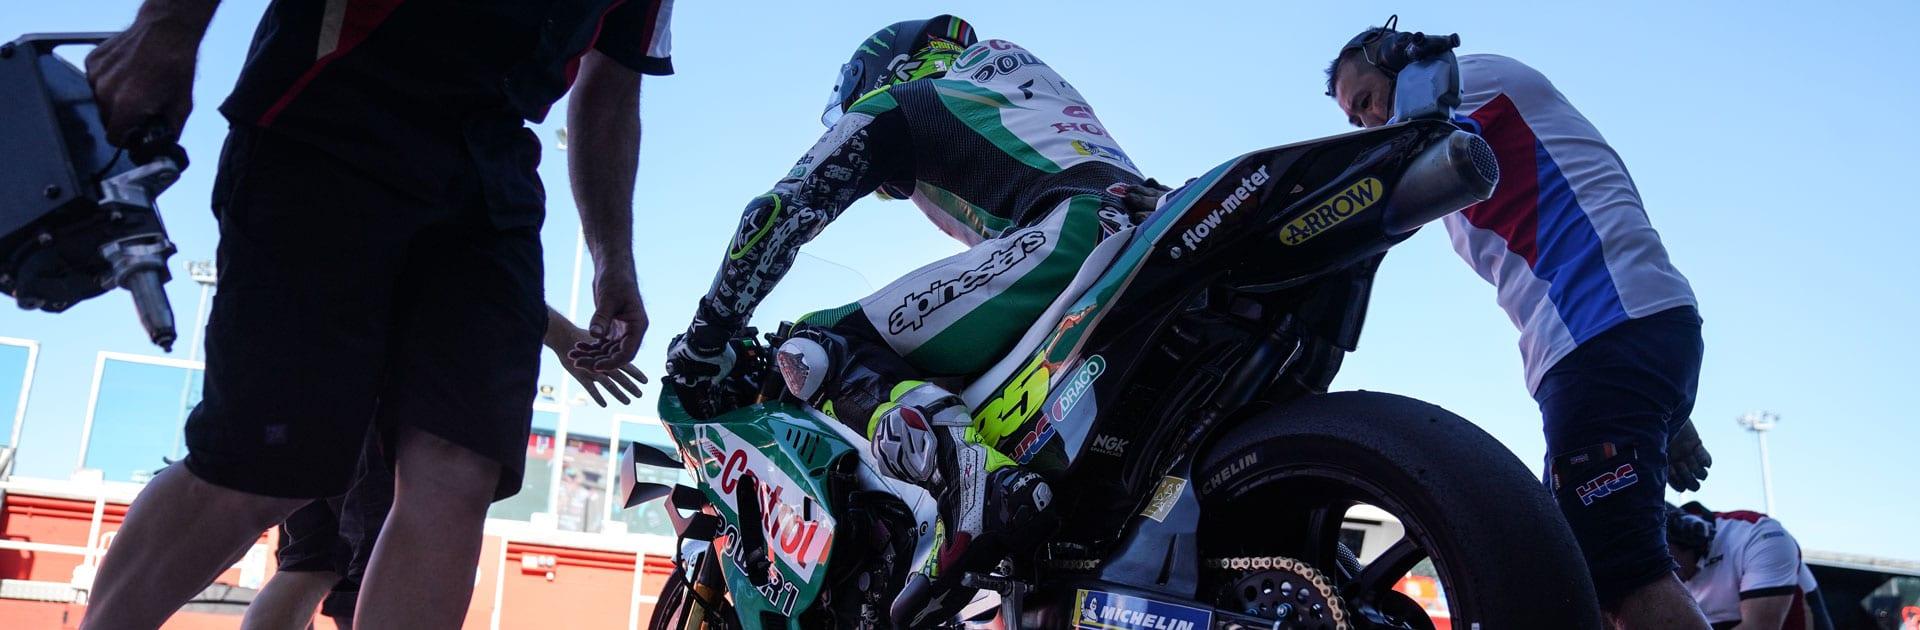 Hospitality: SIFI al Gran Premio MotoGP di San Marino 2019